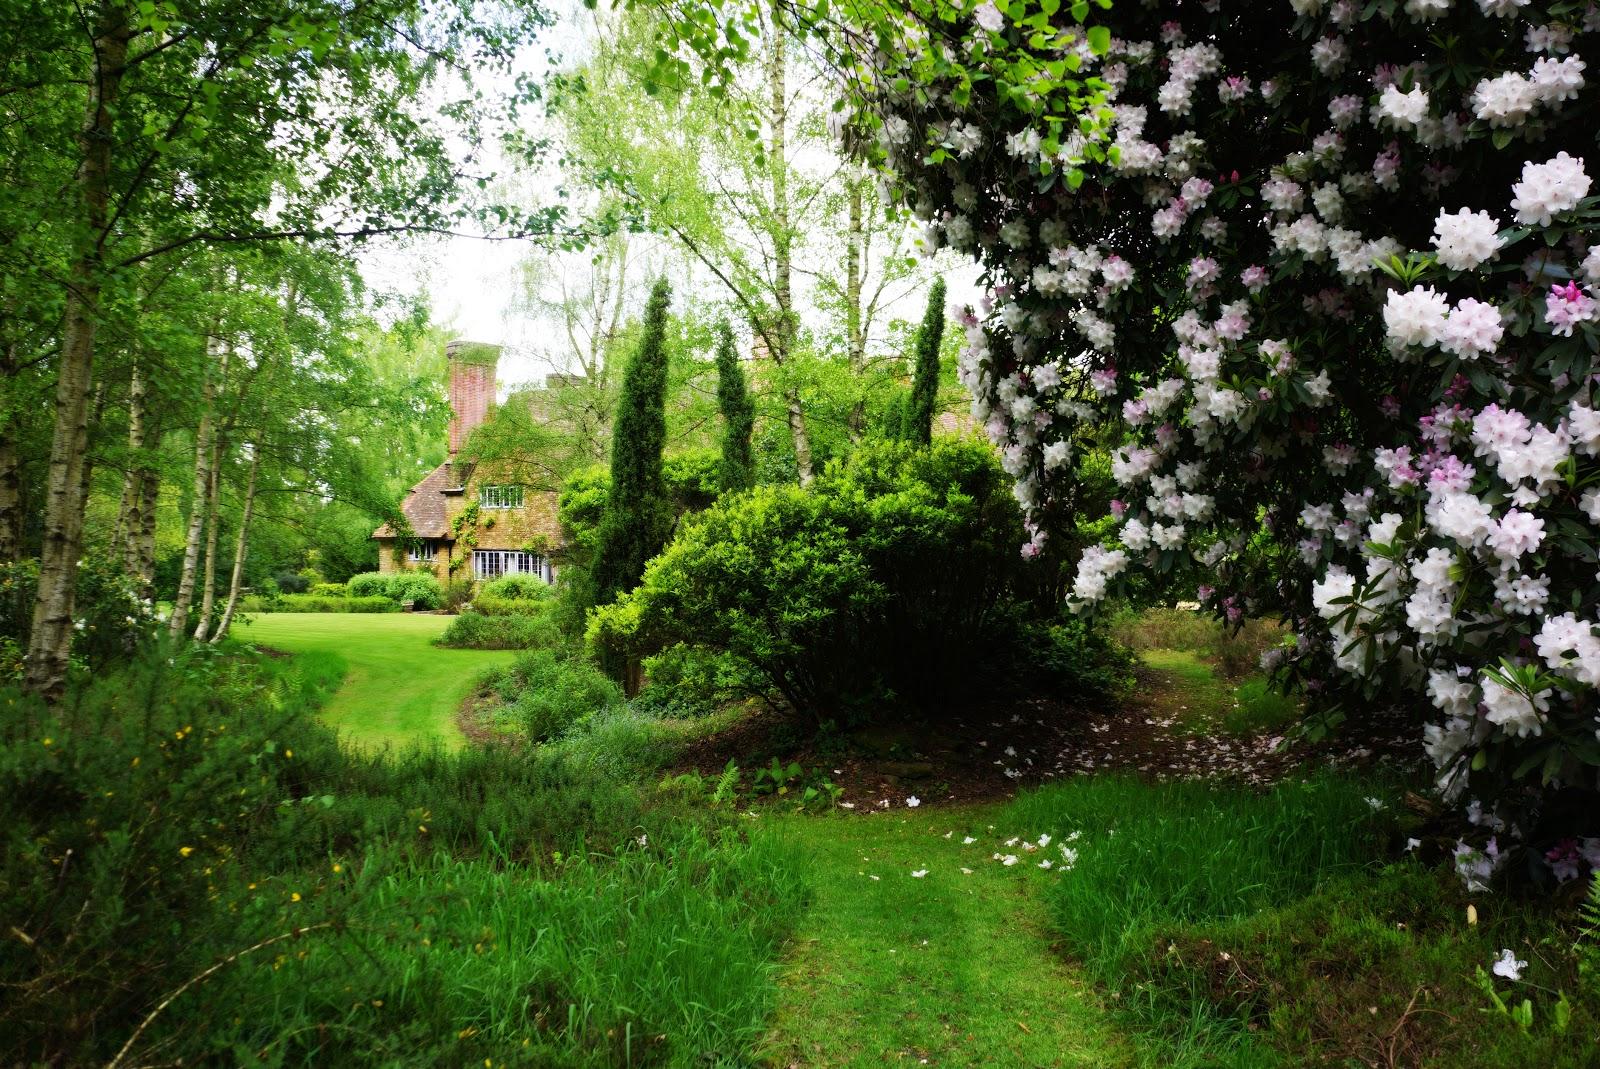 Visit Gertrude Jekyll's Munstead Home